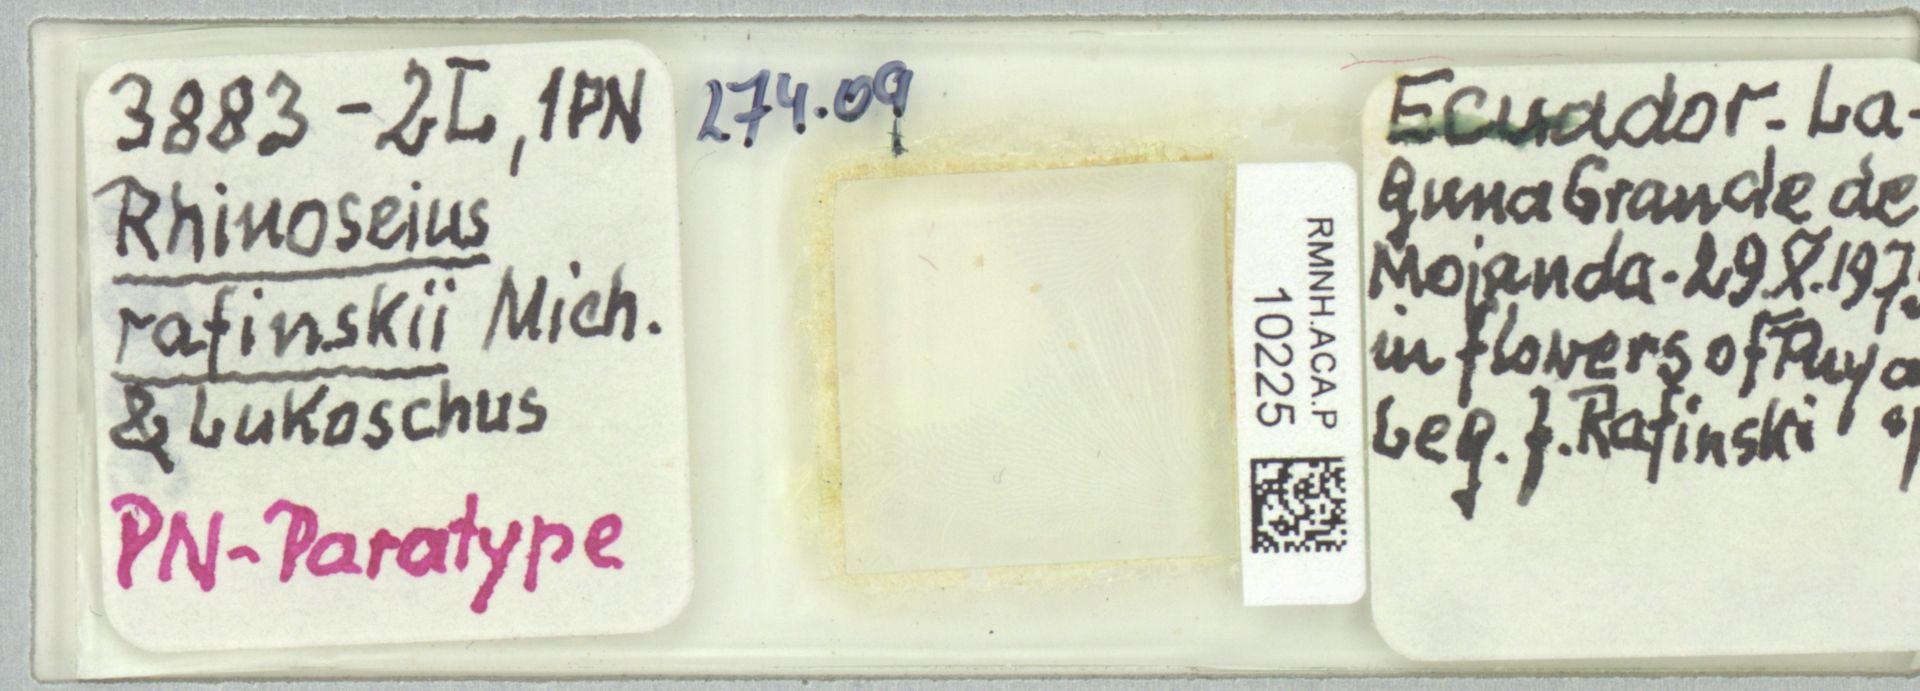 RMNH.ACA.P.10225 | Rhinoseius rafinskii Mich. & Lukoschus